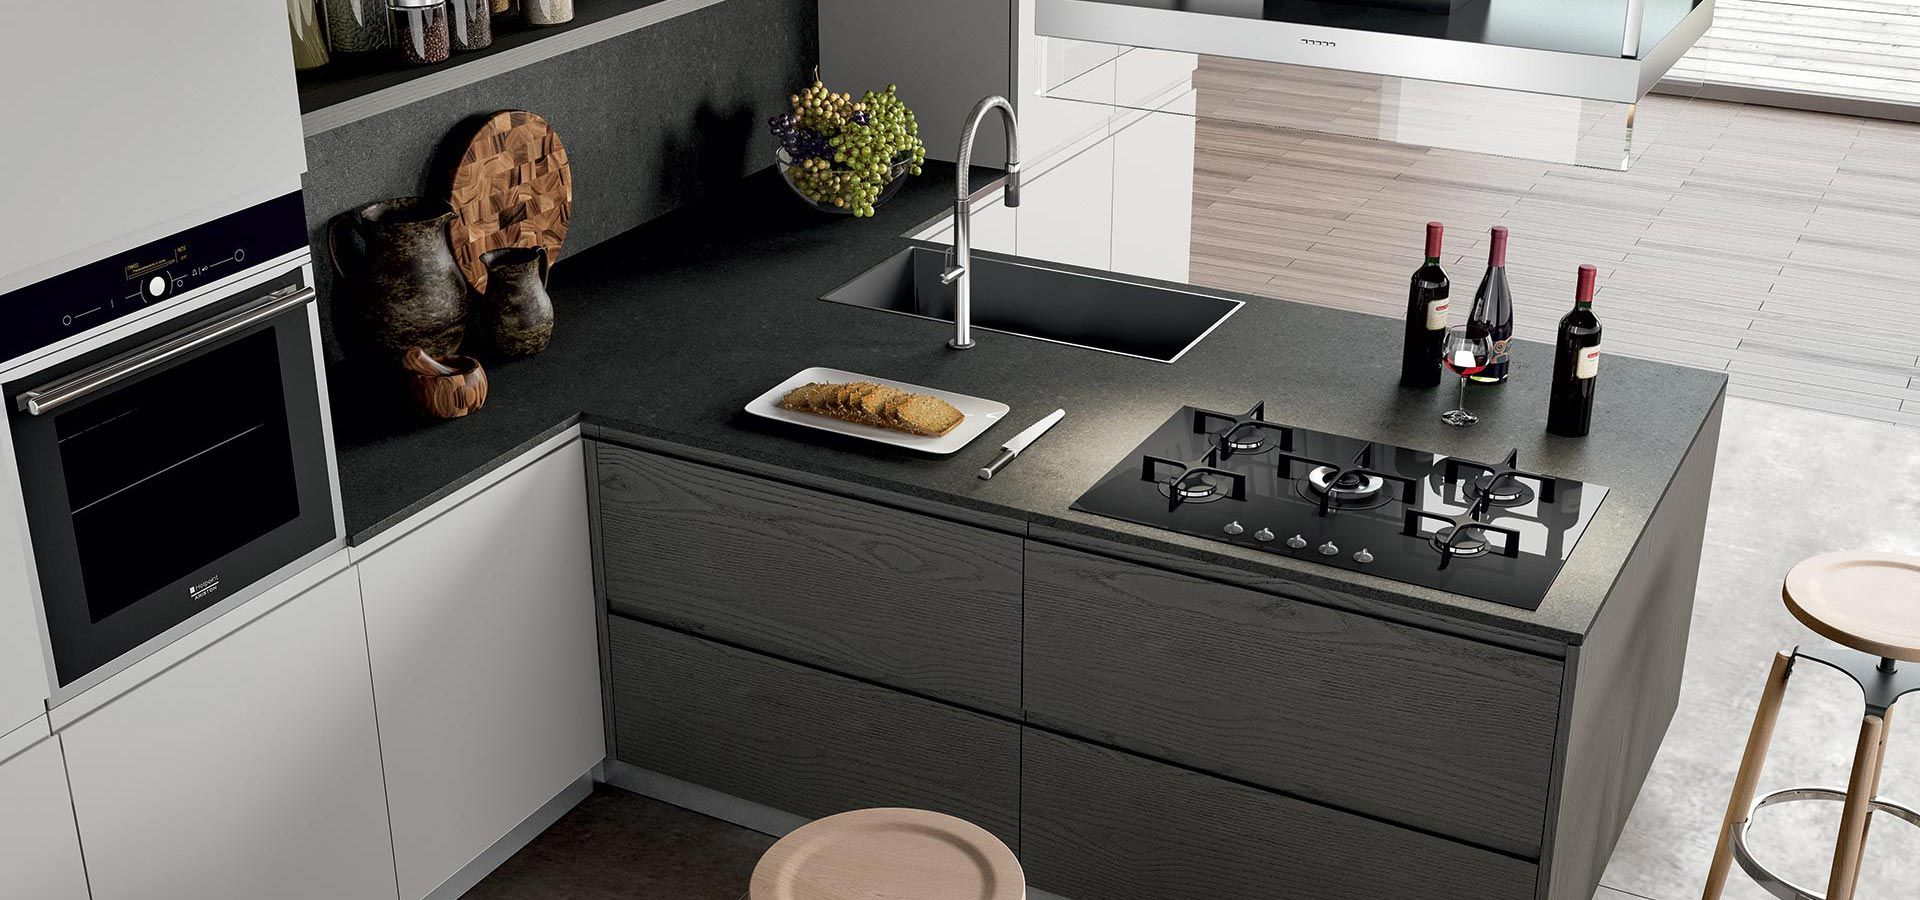 Cucina moderna wega finitura impiallacciato rovere - Okite piano cucina ...